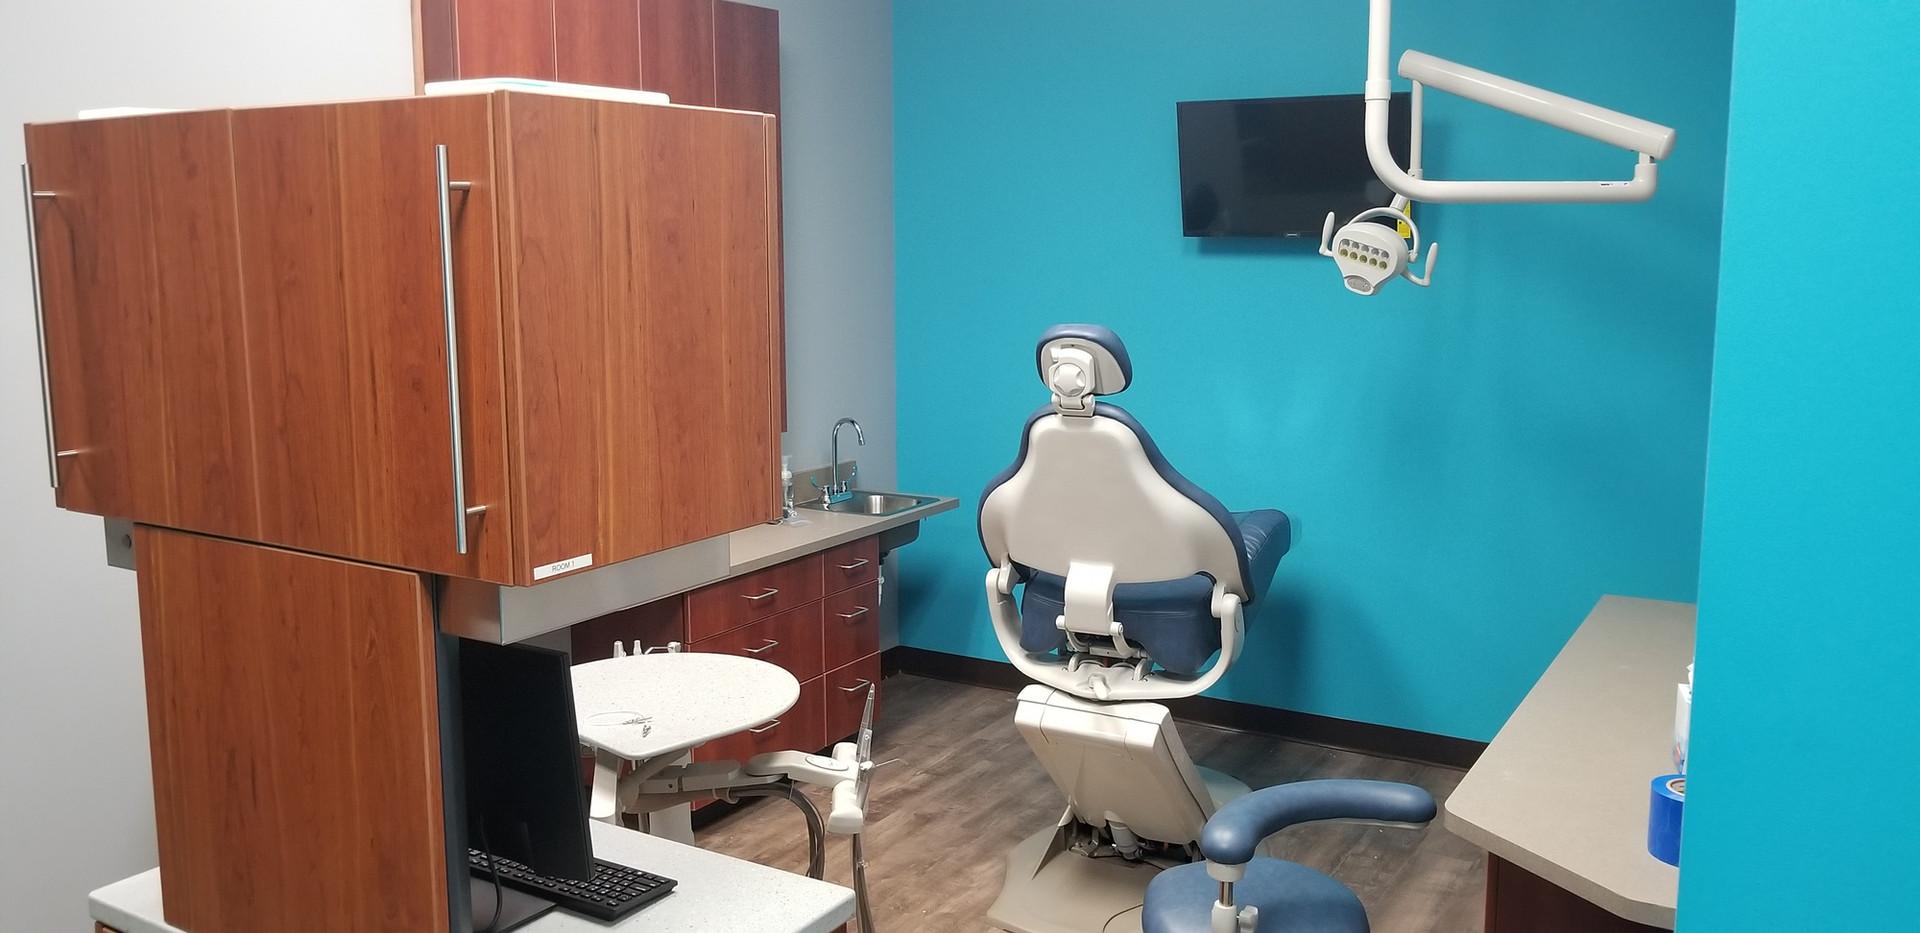 Dentist Chair & Office - BuildoutPros